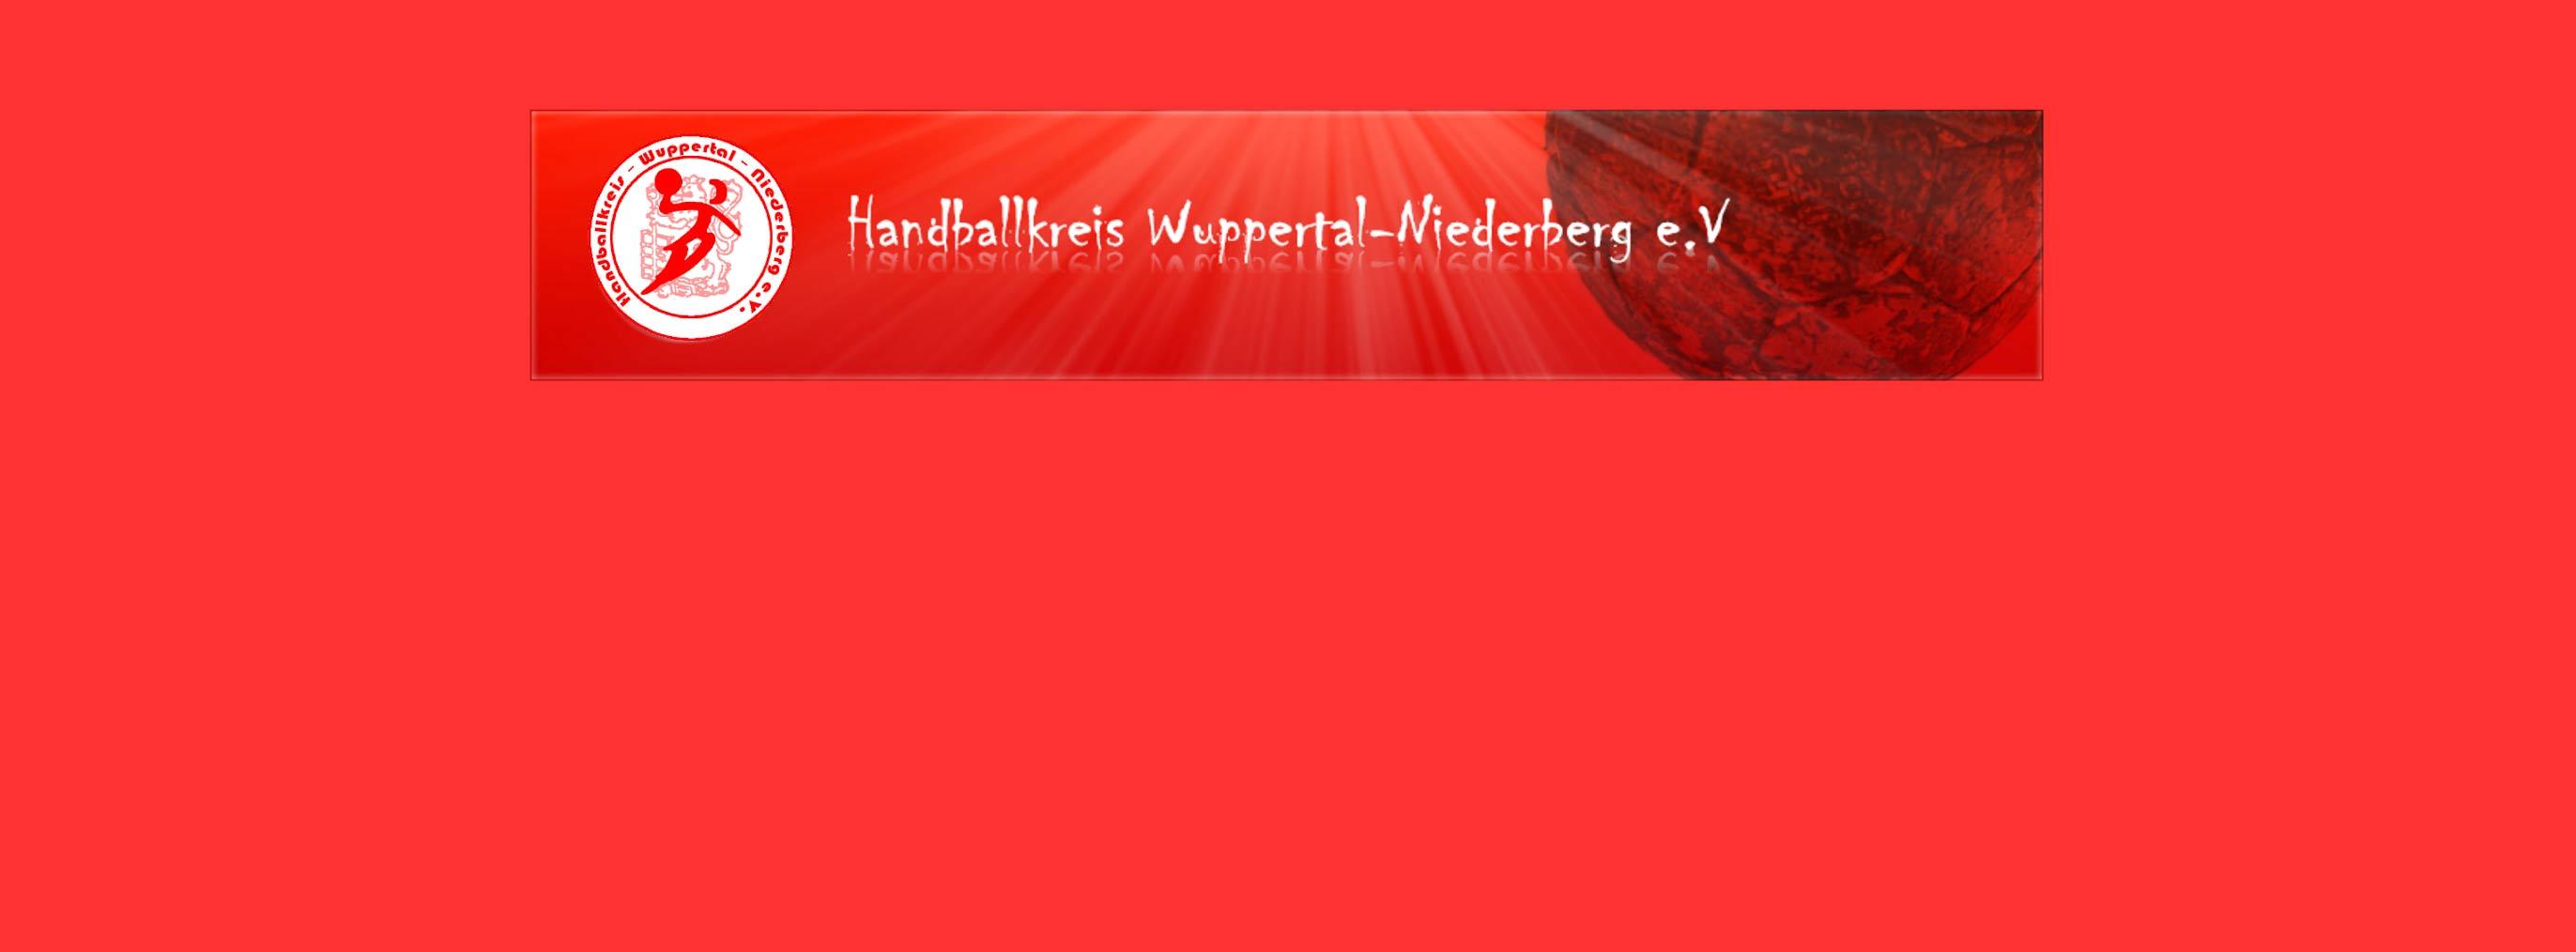 00 HR Banner HK Wuppertal Niederberg 2